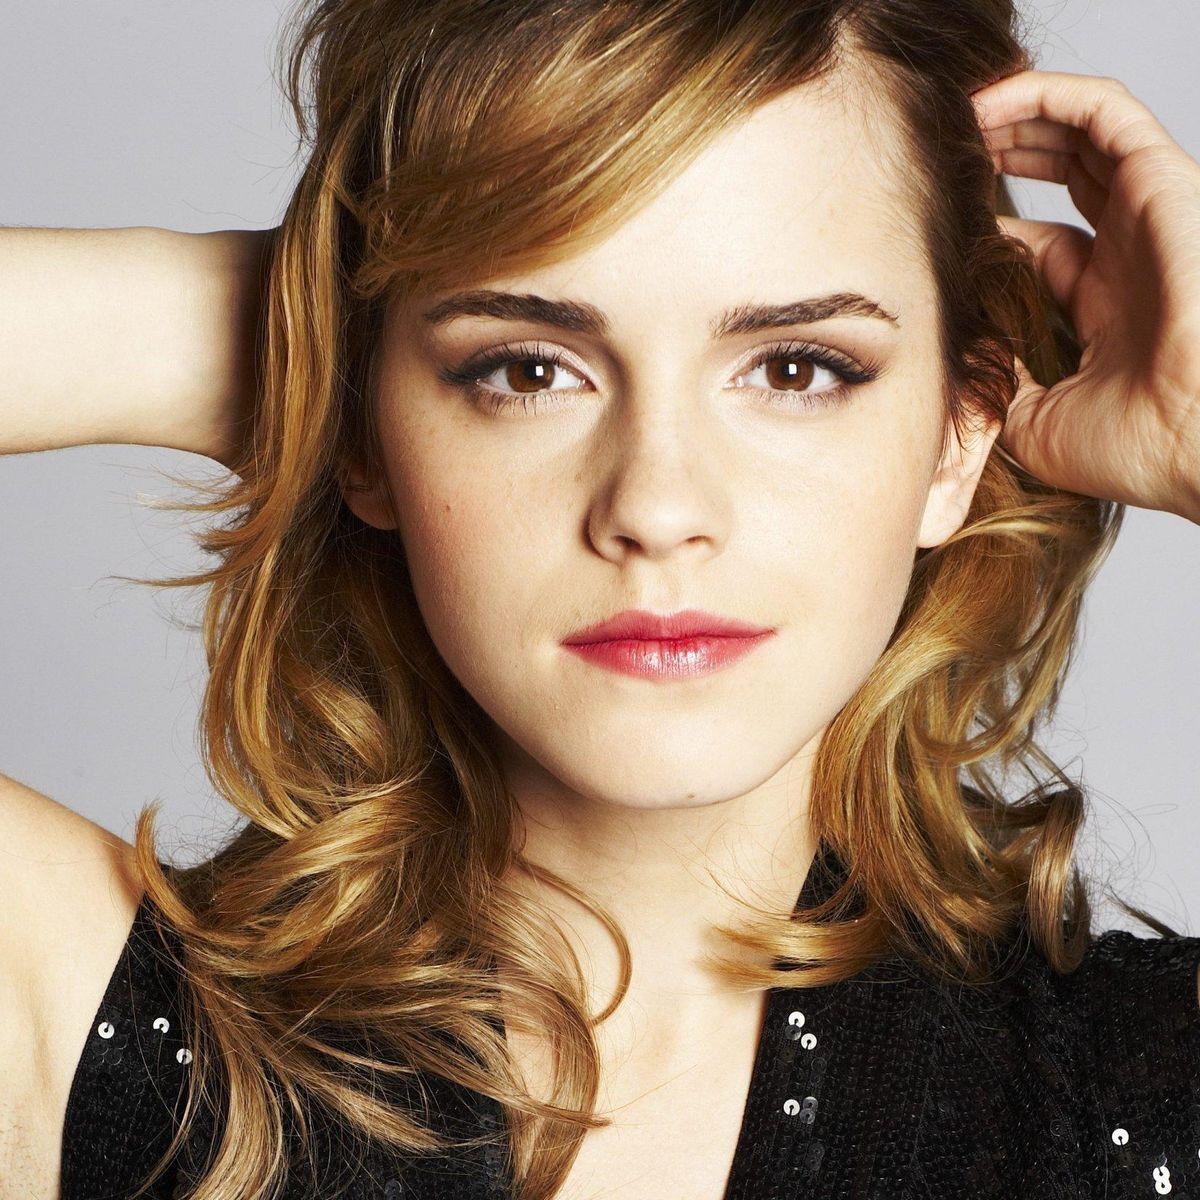 Emma-Watson-emma-watson-13071732-2494-1663.jpg